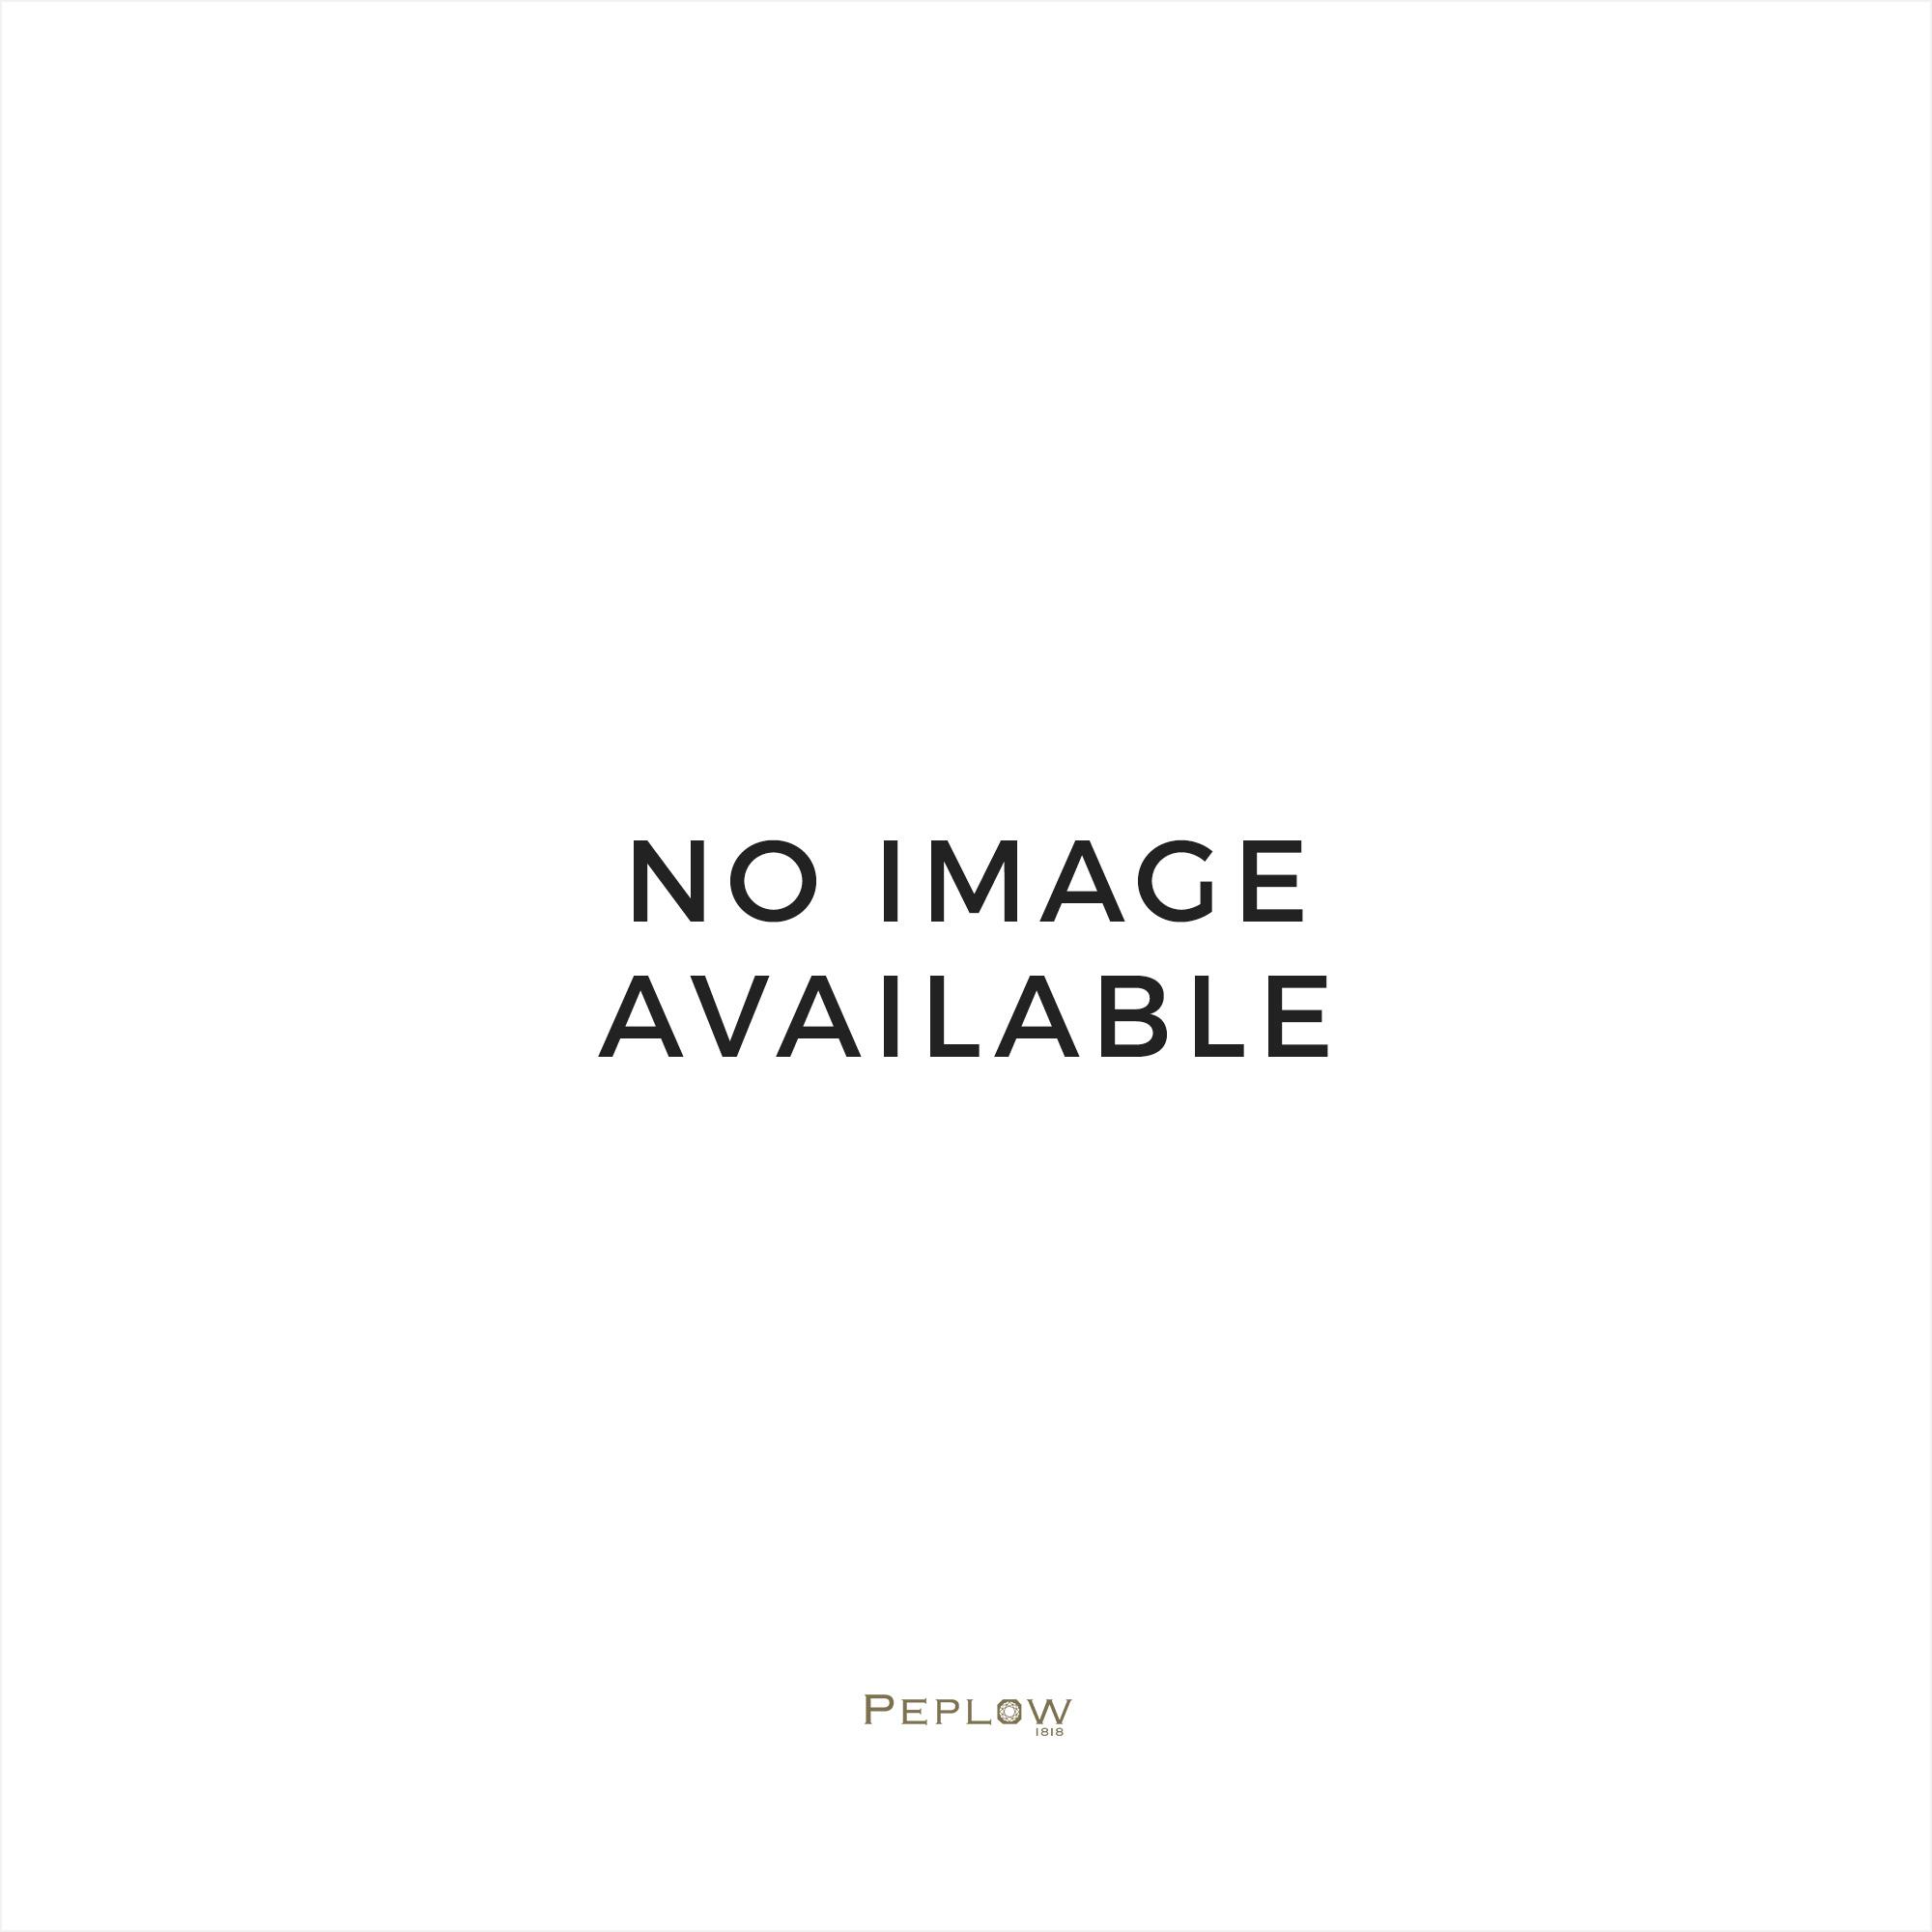 Montblanc le Grand black 146 fountain pen, ref 13661